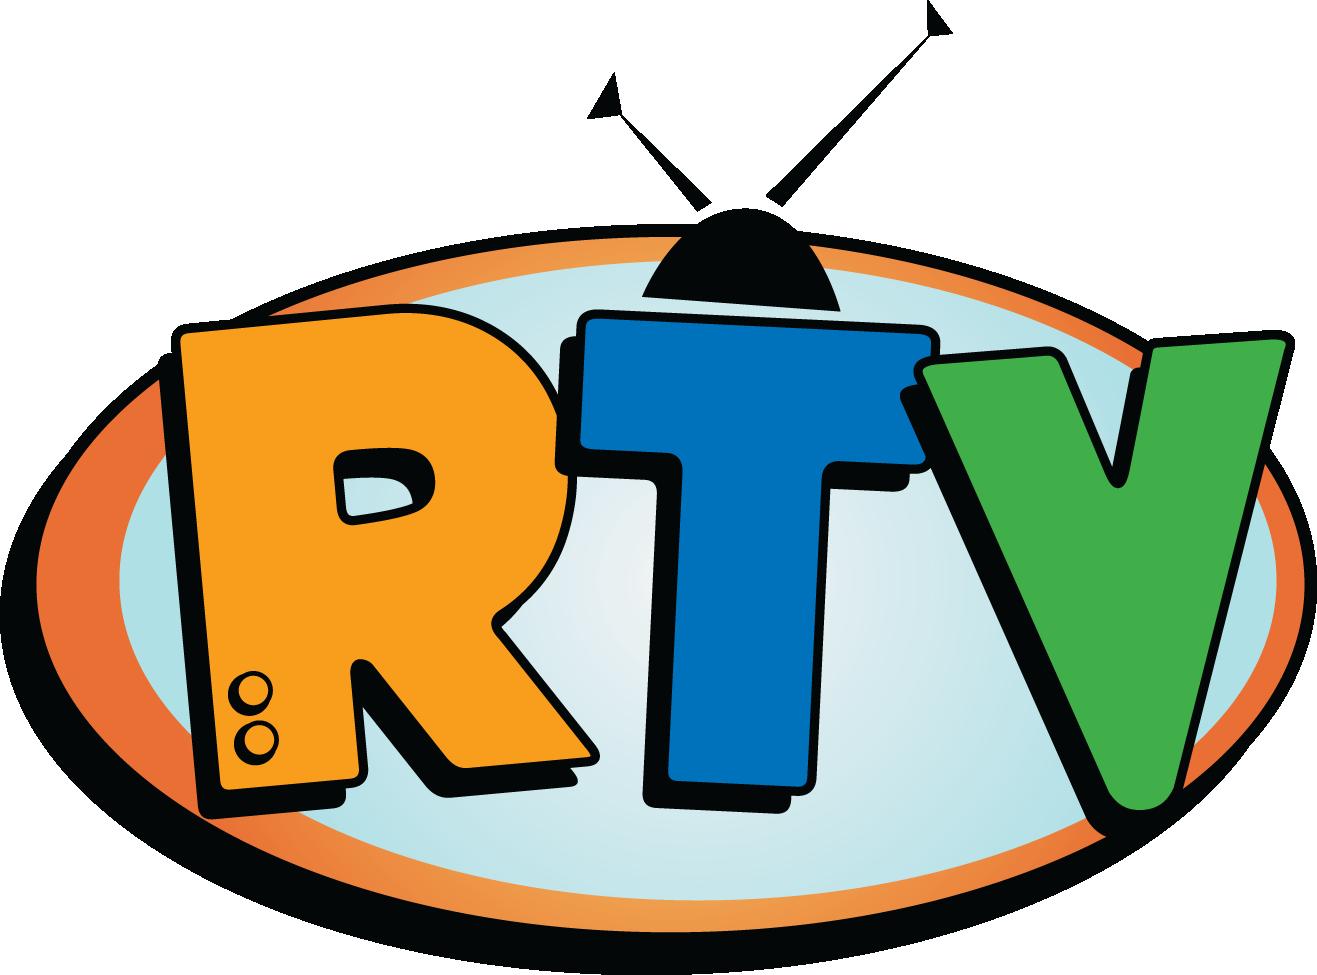 Retro Television Network | Logopedia | FANDOM powered by Wikia